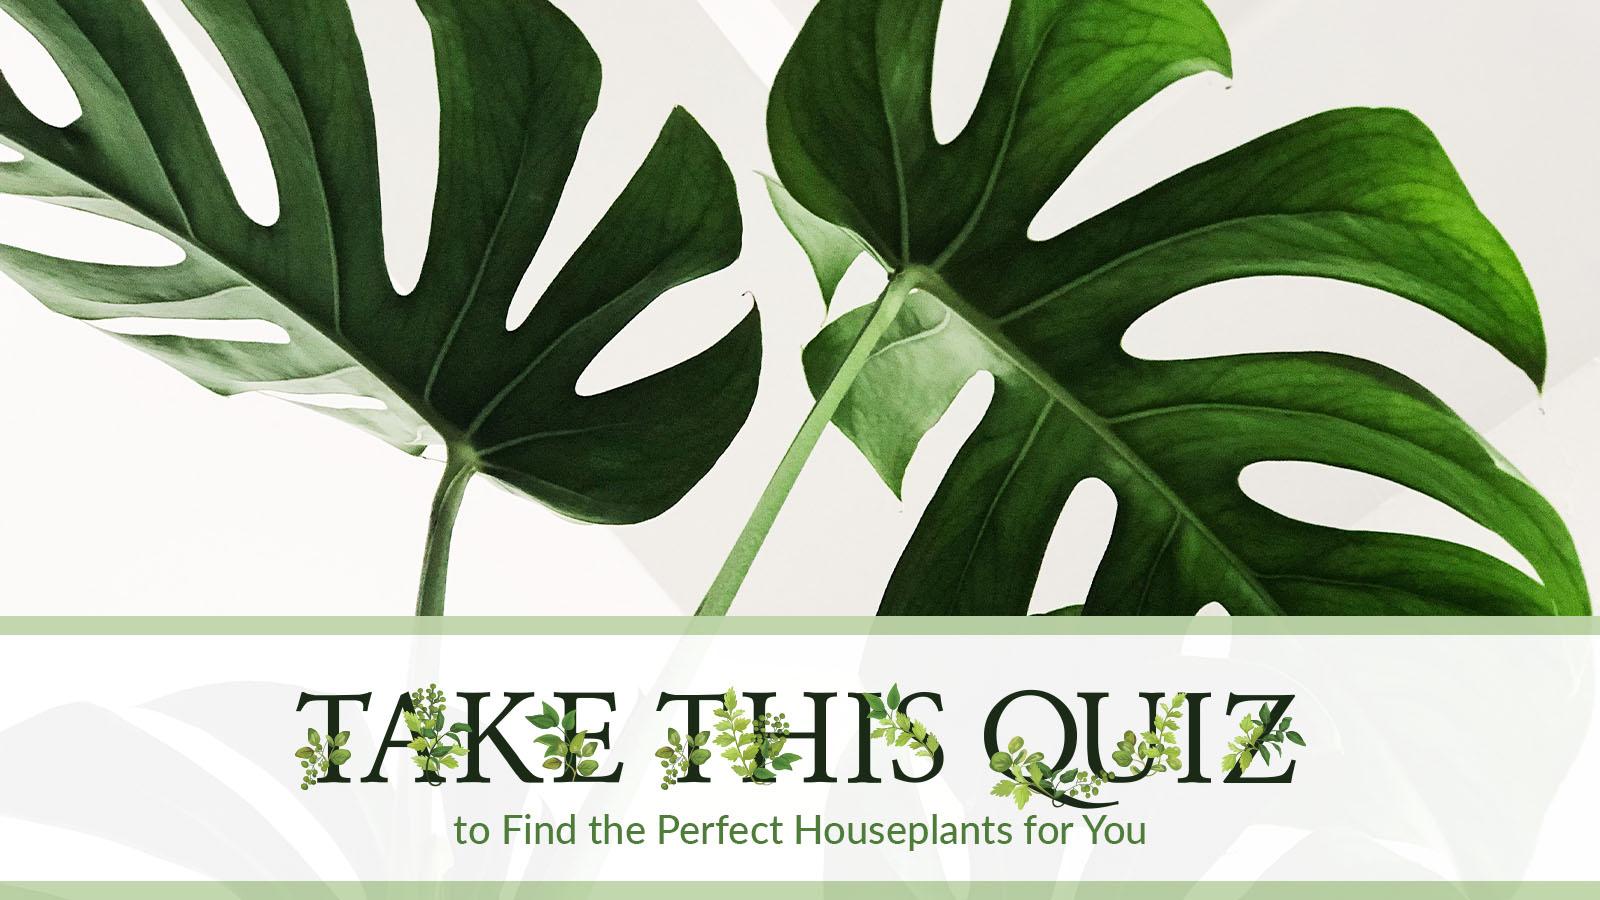 somo-req-houseplantsquiz-012720-featured-940×400-1